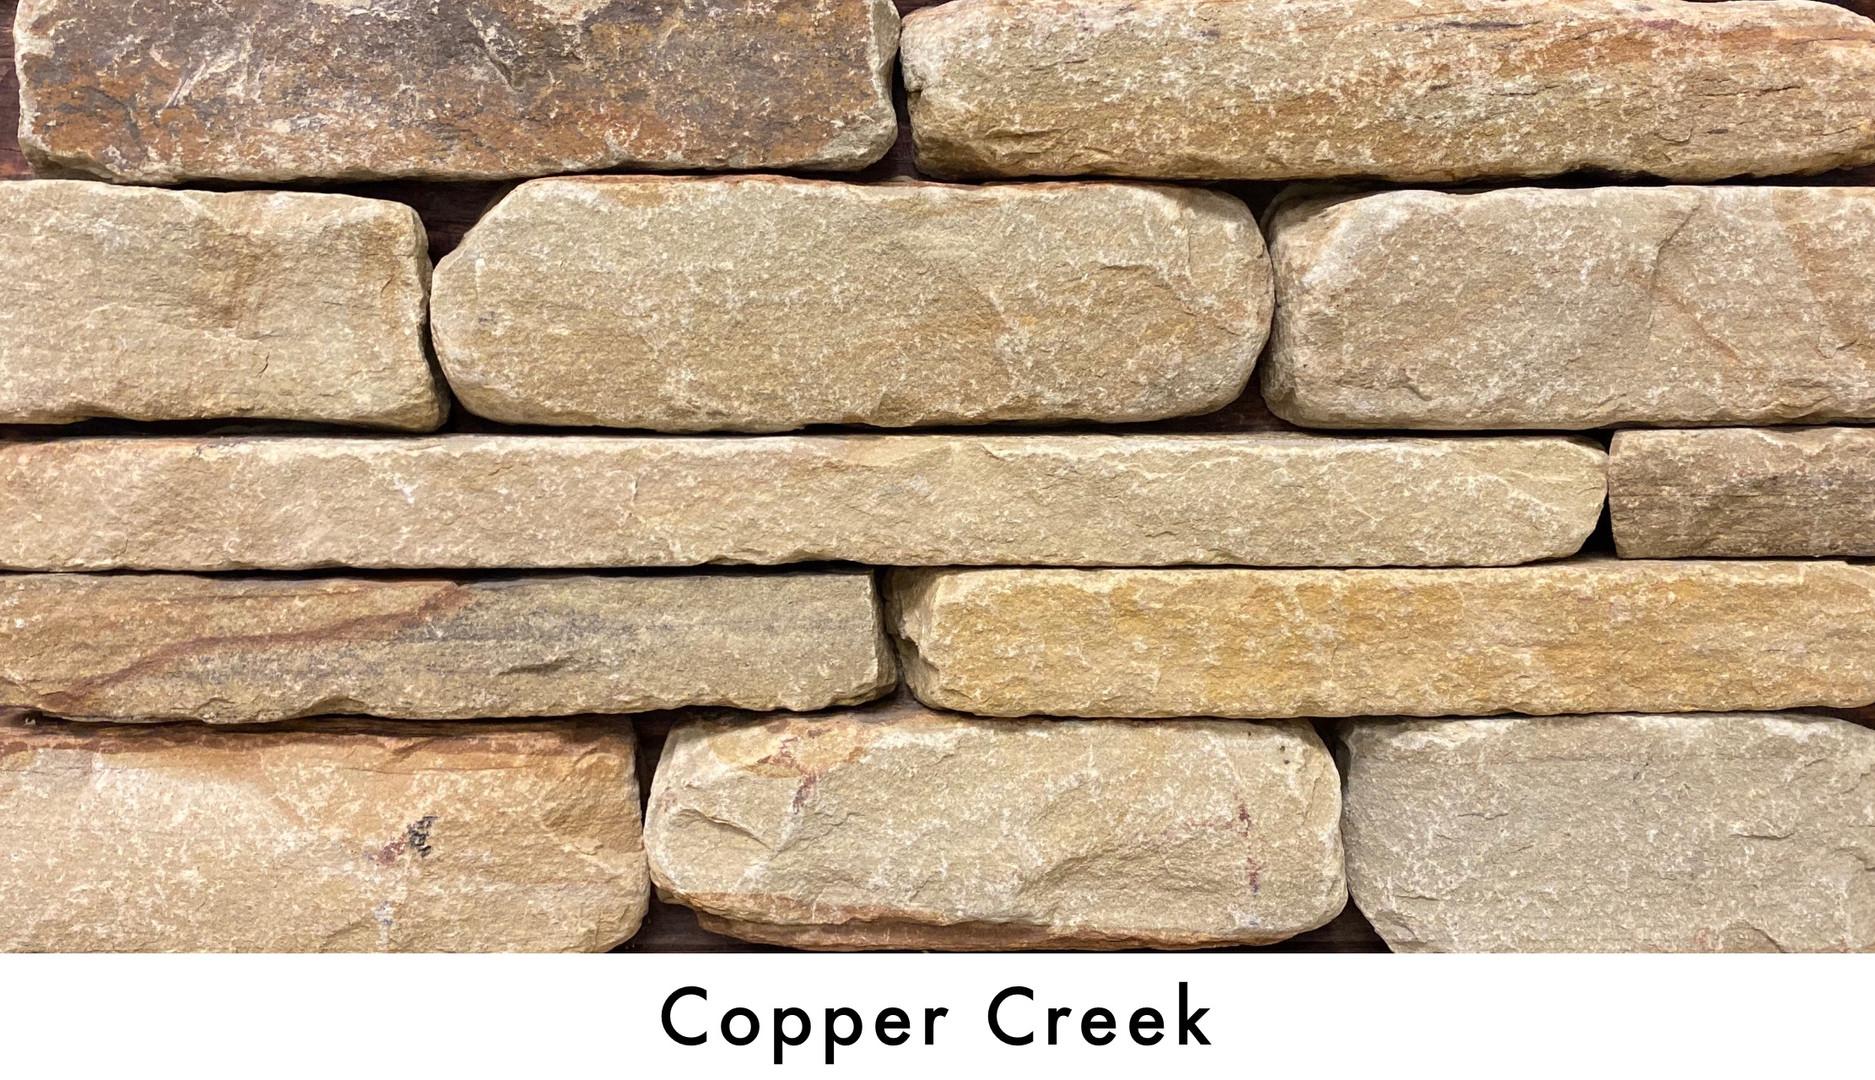 Copper Creek